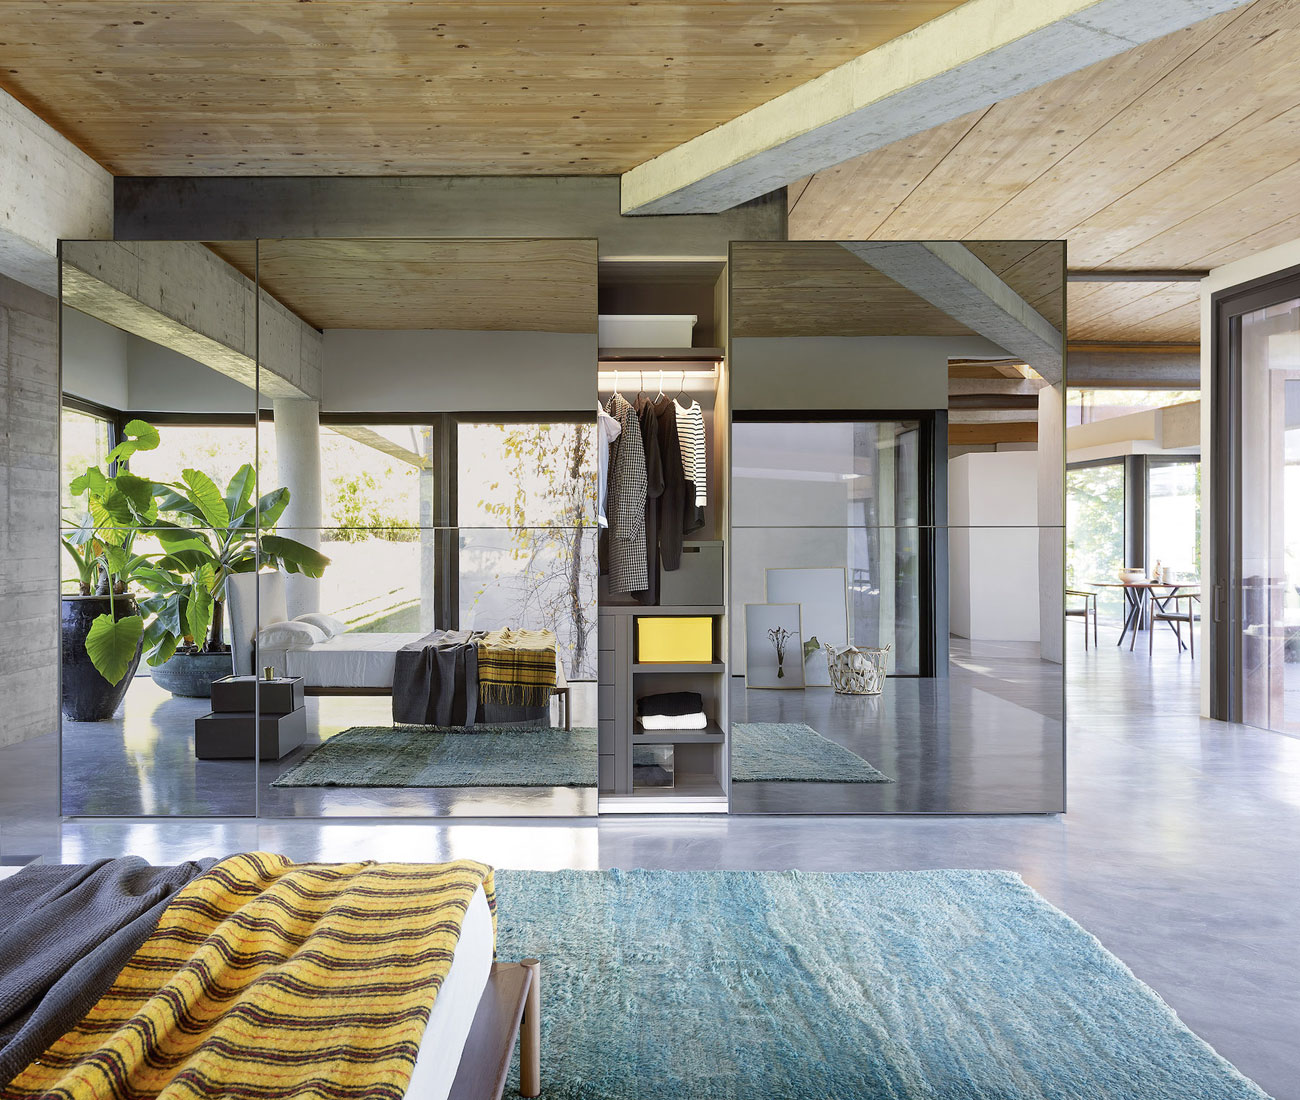 trevisana kitchens & interiors - European-style closets